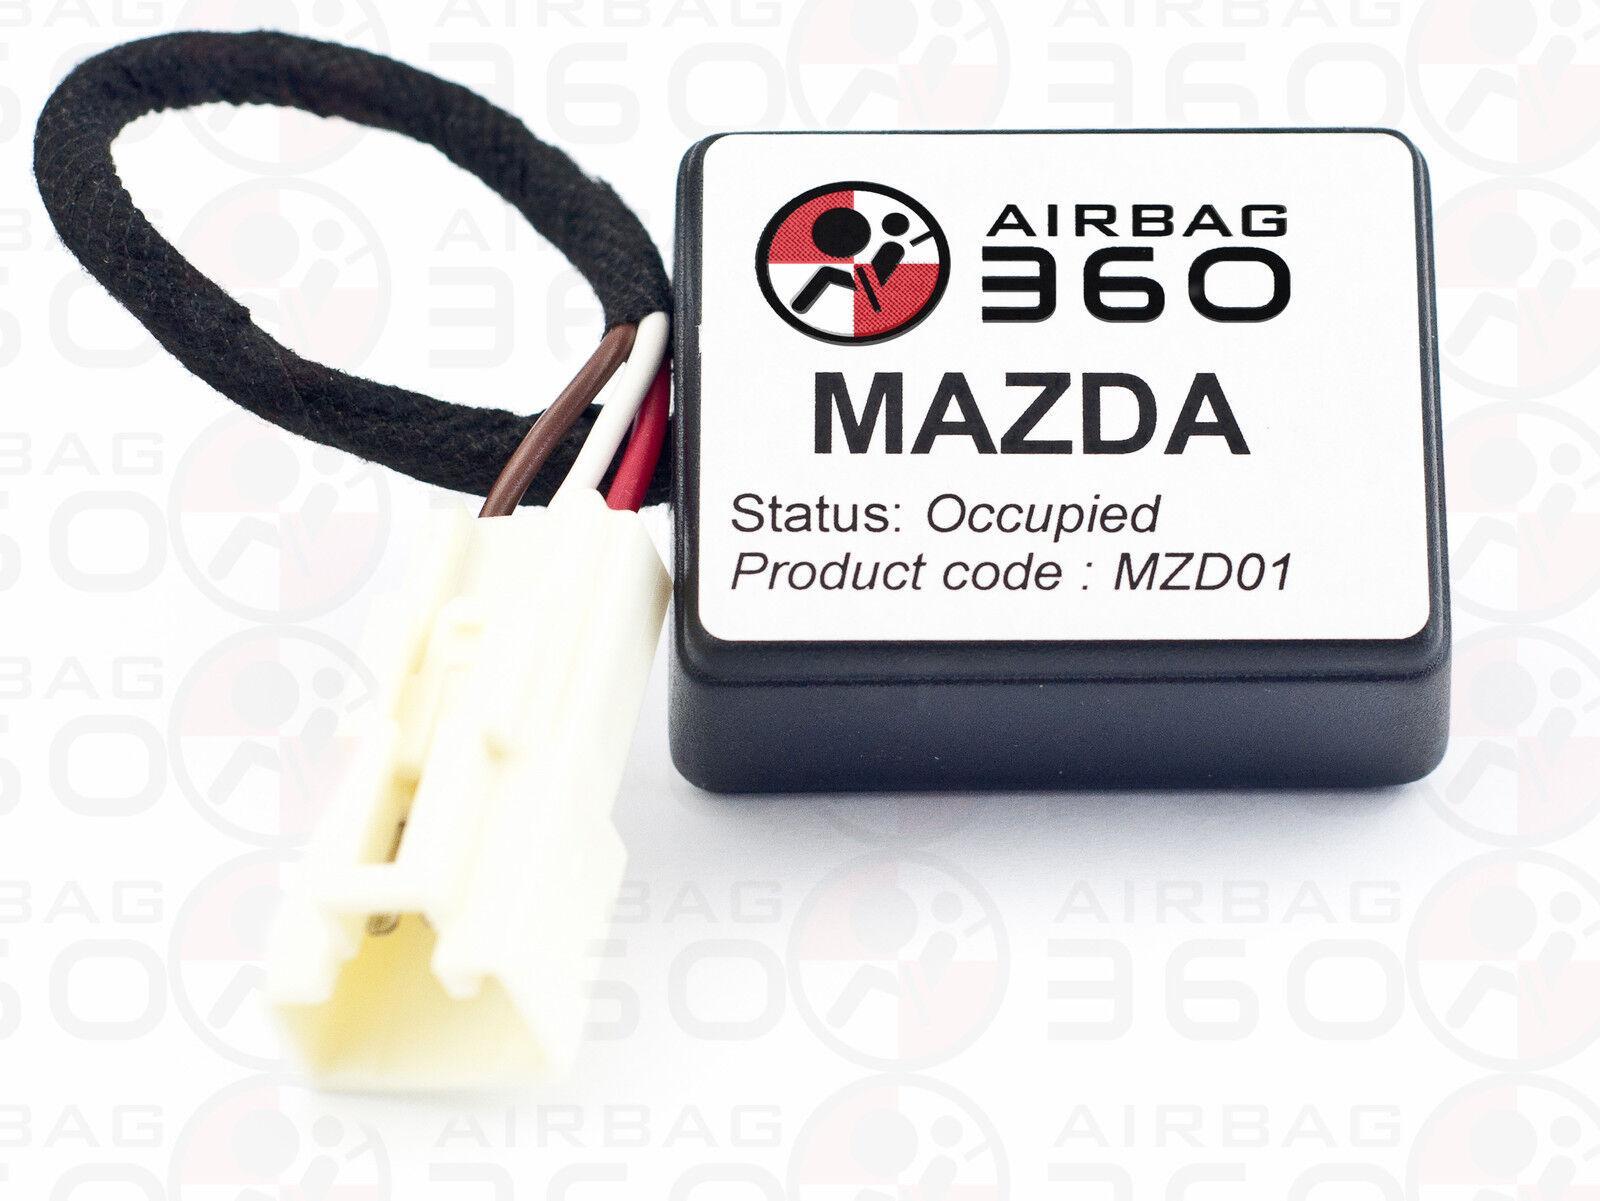 $_10 Mazda Airbag Passenger Seat Sensor Occupancy Emulator Plug